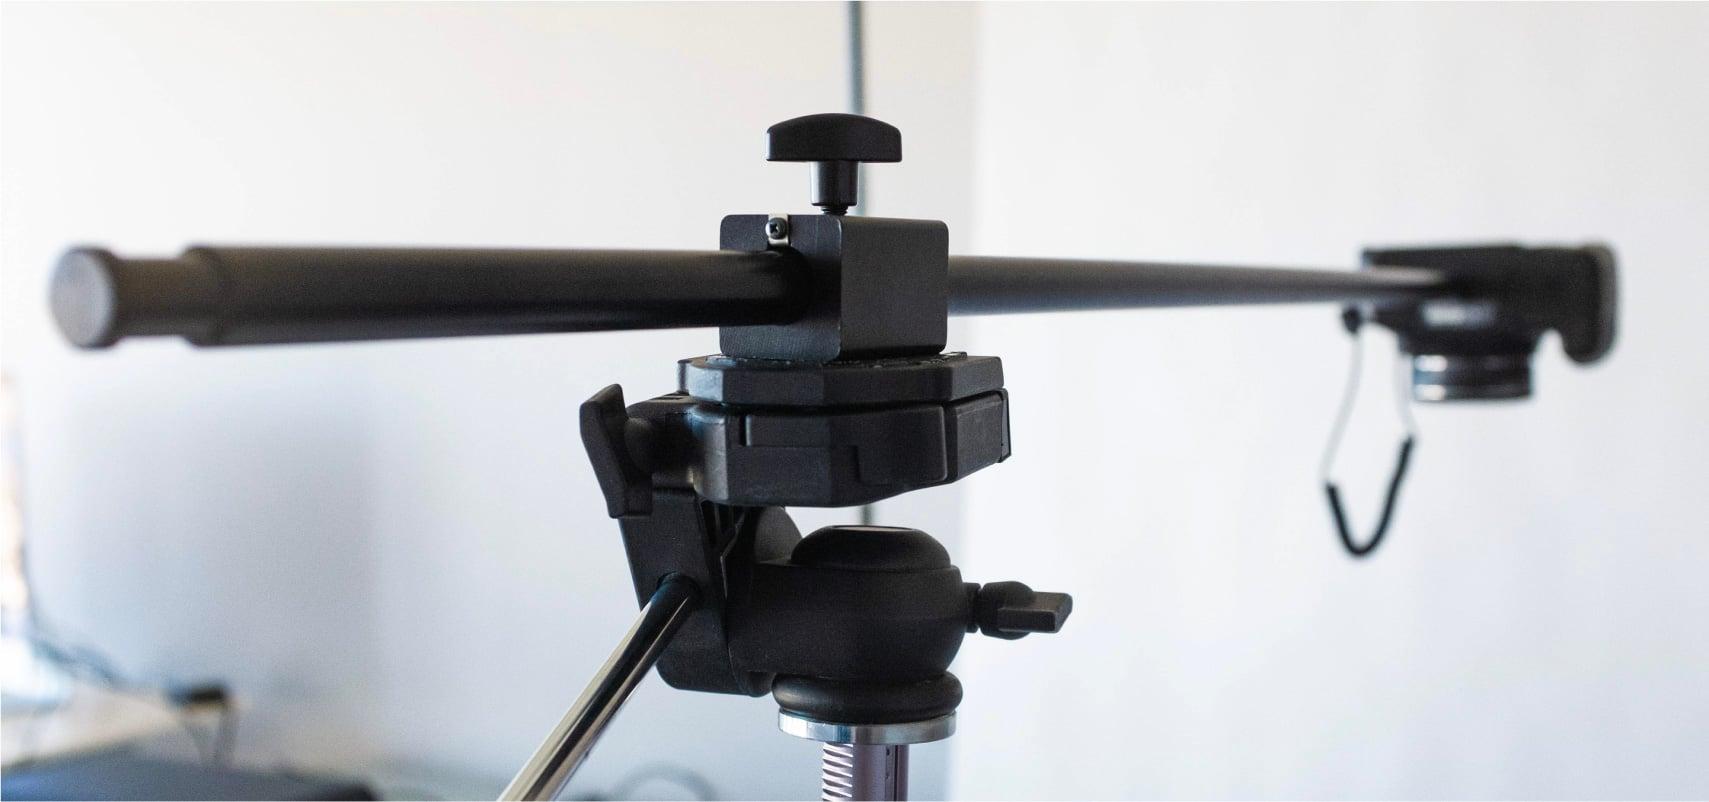 Overhead tripod adaptor